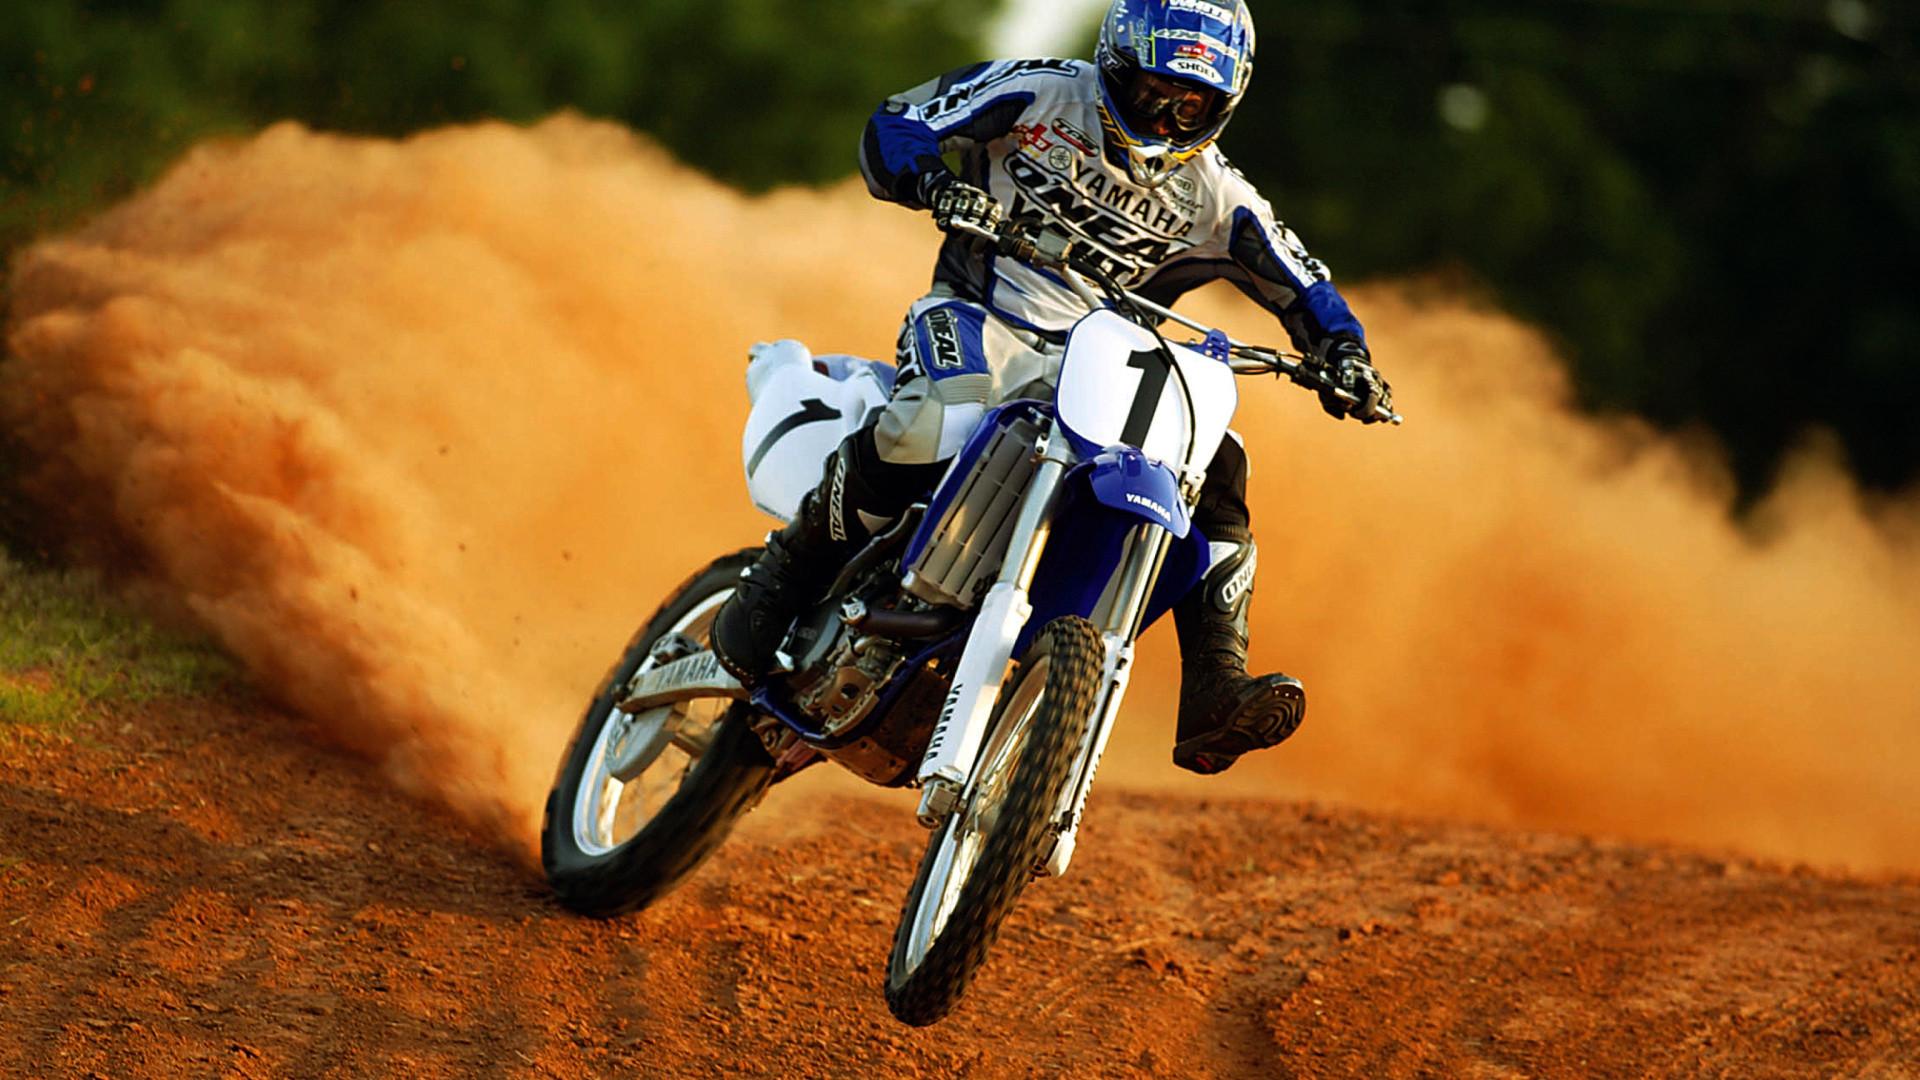 Pictures Dirt Bike Wallpaper HD.